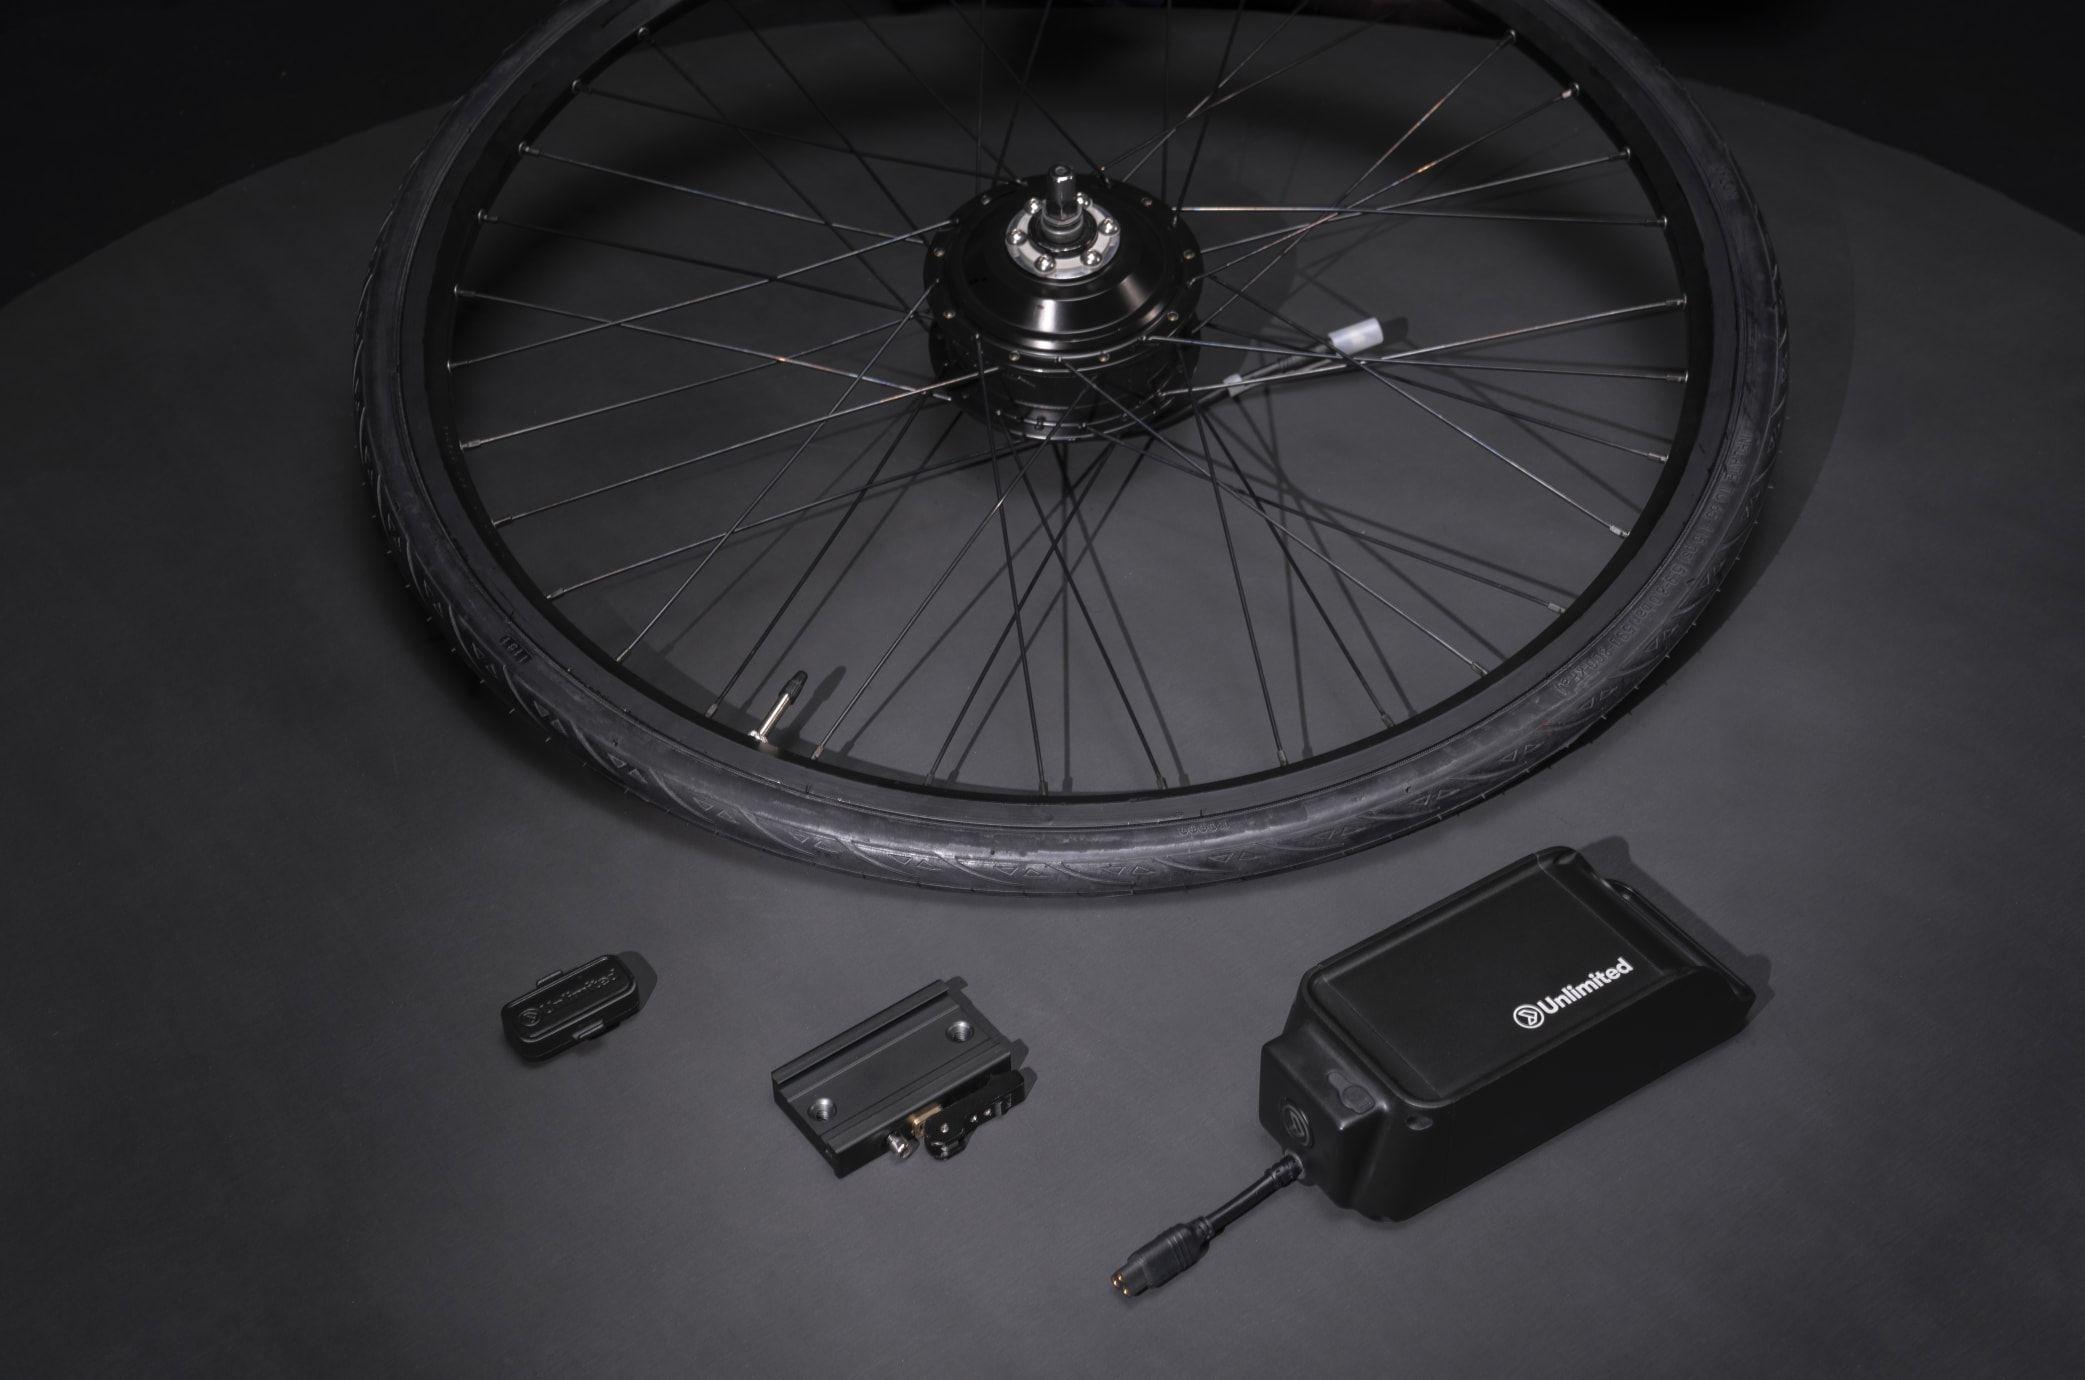 The Unlimited Ebike Conversion Kit Indiegogo In 2020 Electric Bike Diy Cheap Electric Bike Electric Skateboard Kit